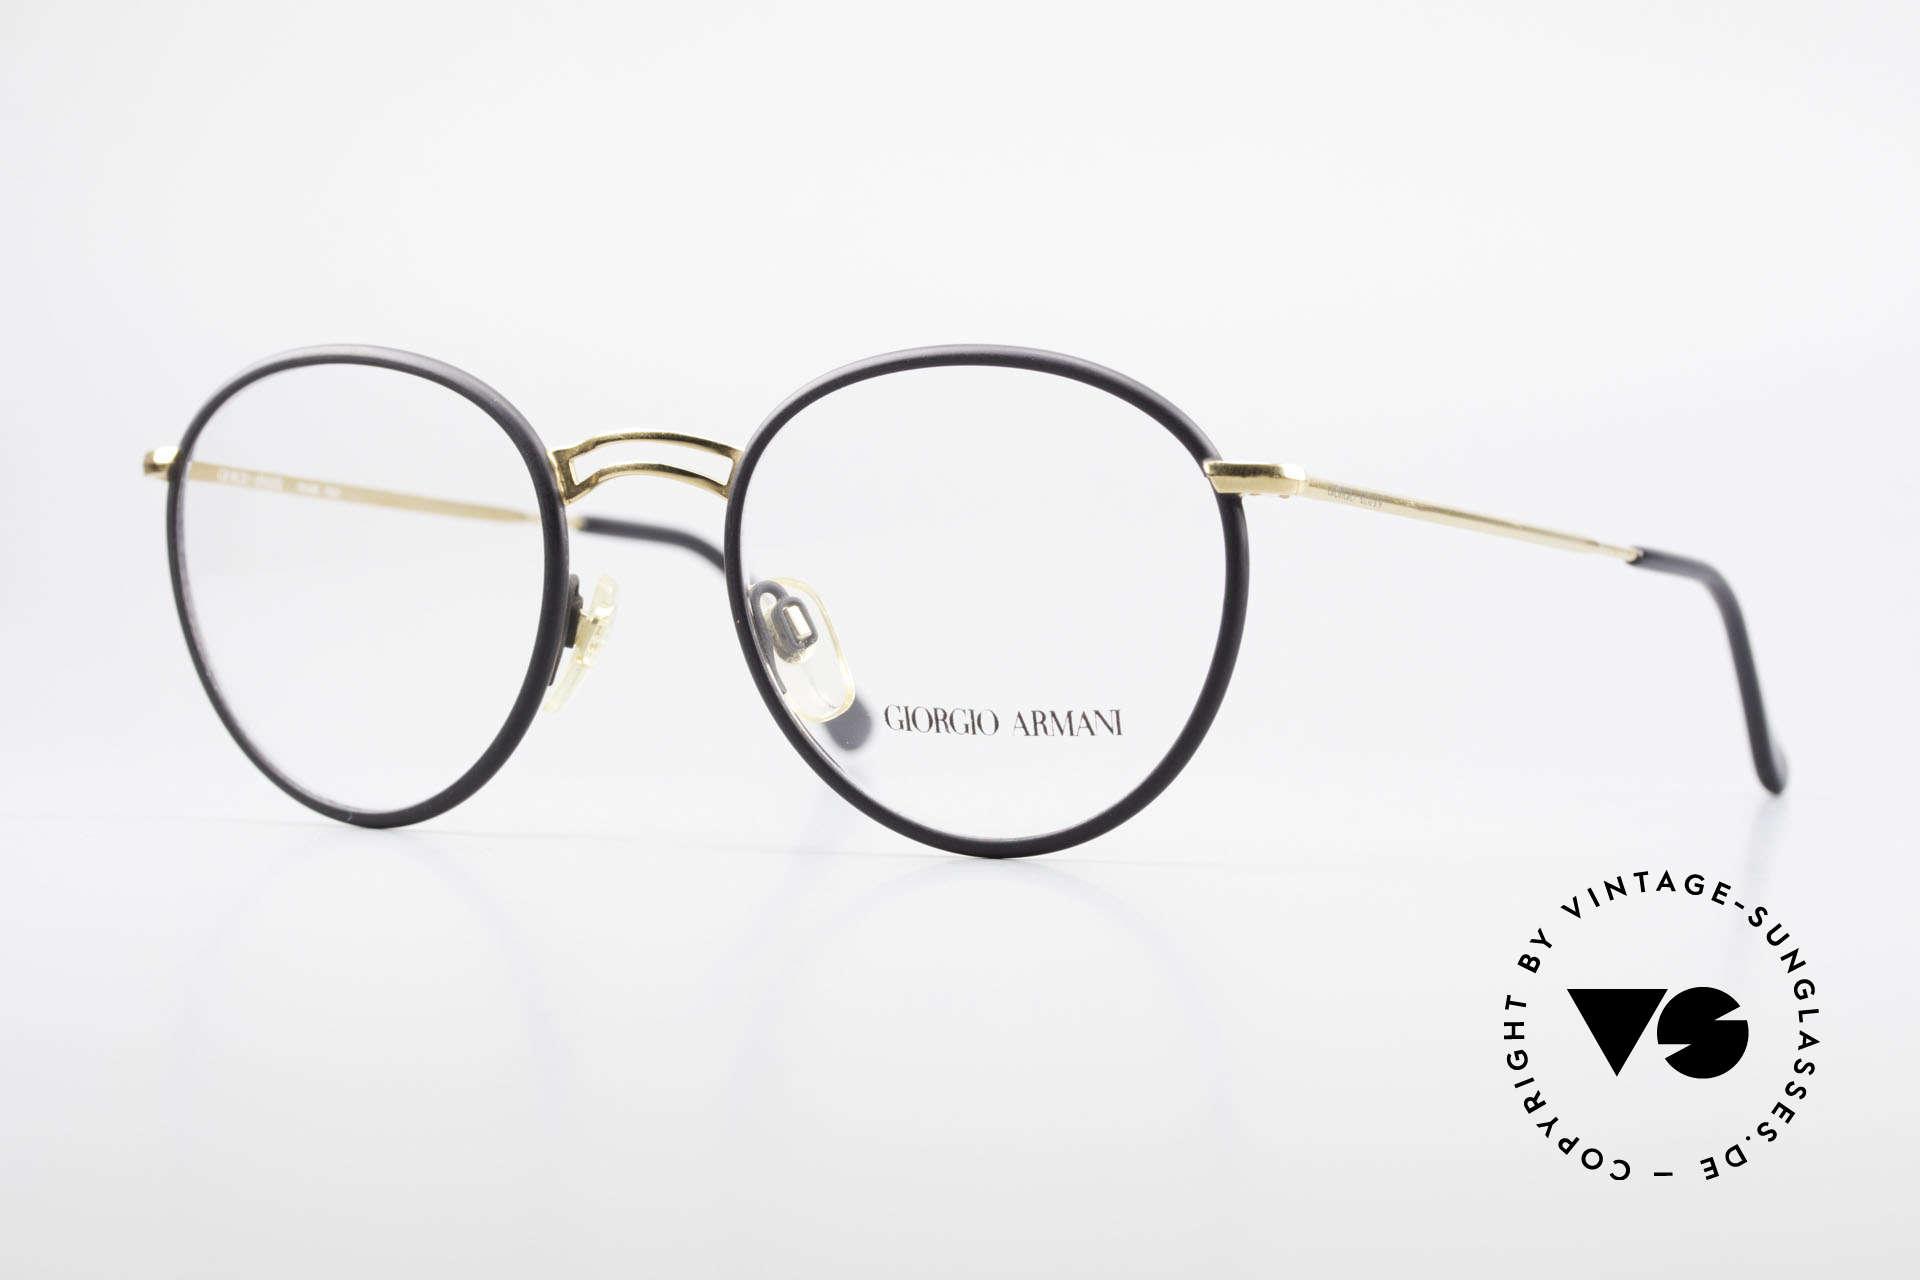 Giorgio Armani 152 Classic Round Vintage Frame, timeless vintage Giorgio Armani designer eyeglasses, Made for Men